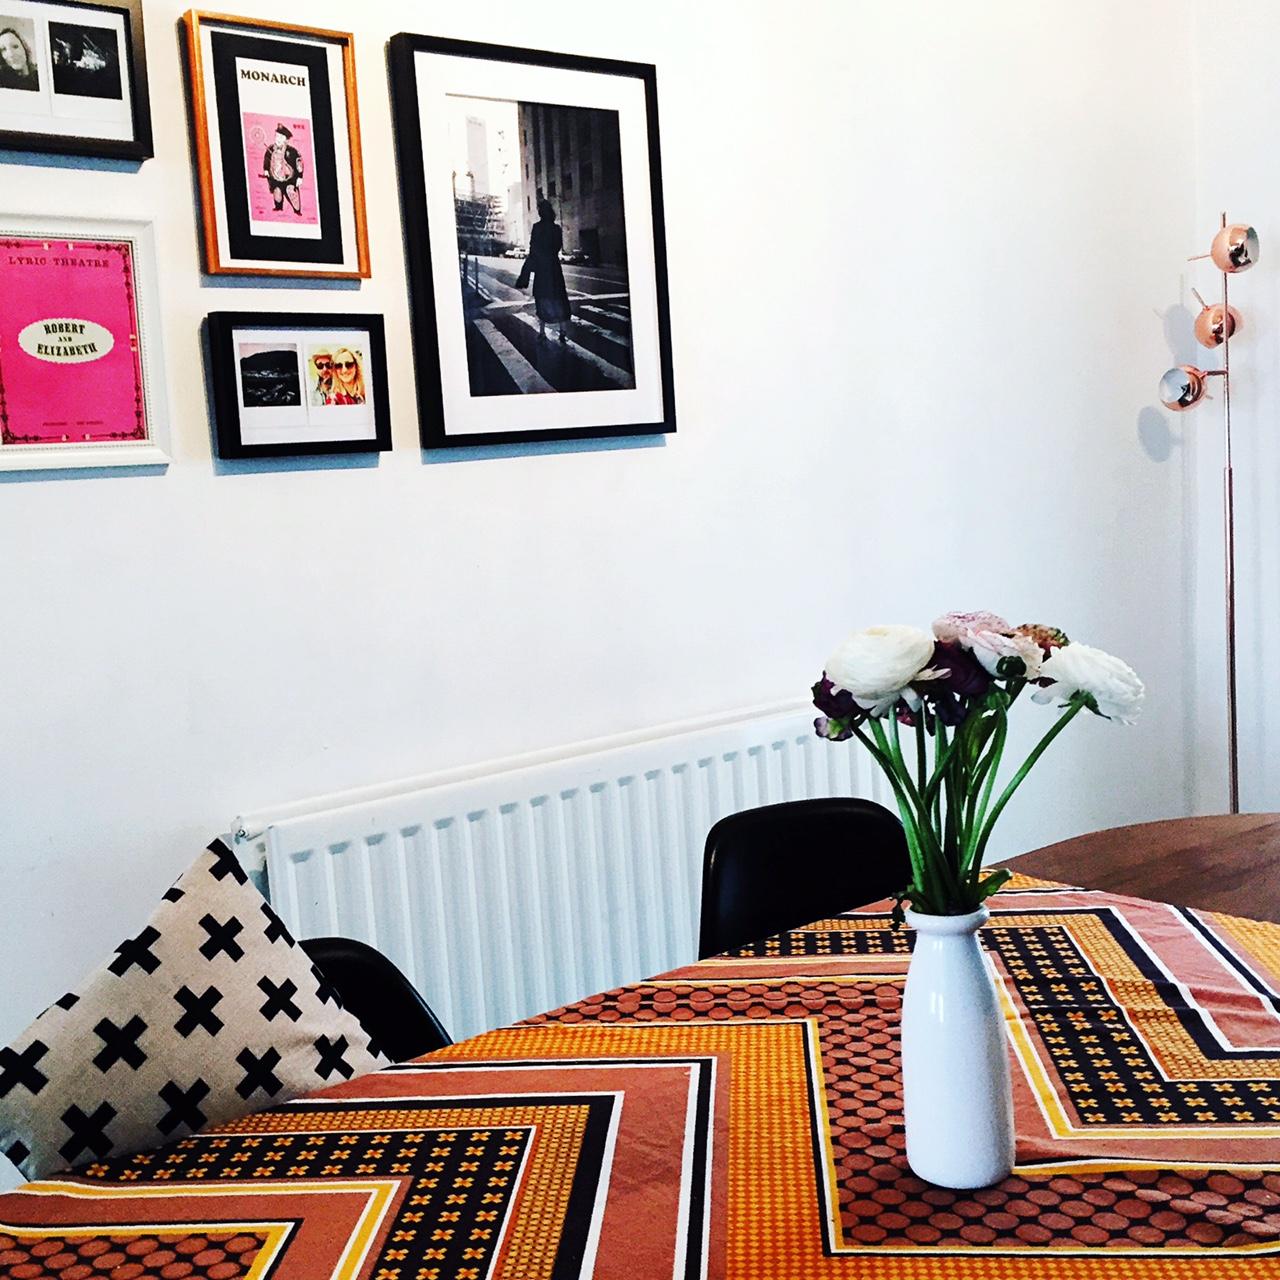 theinkcloset-blog-cheltenham-home-decor-prints-frames-aztec.JPG